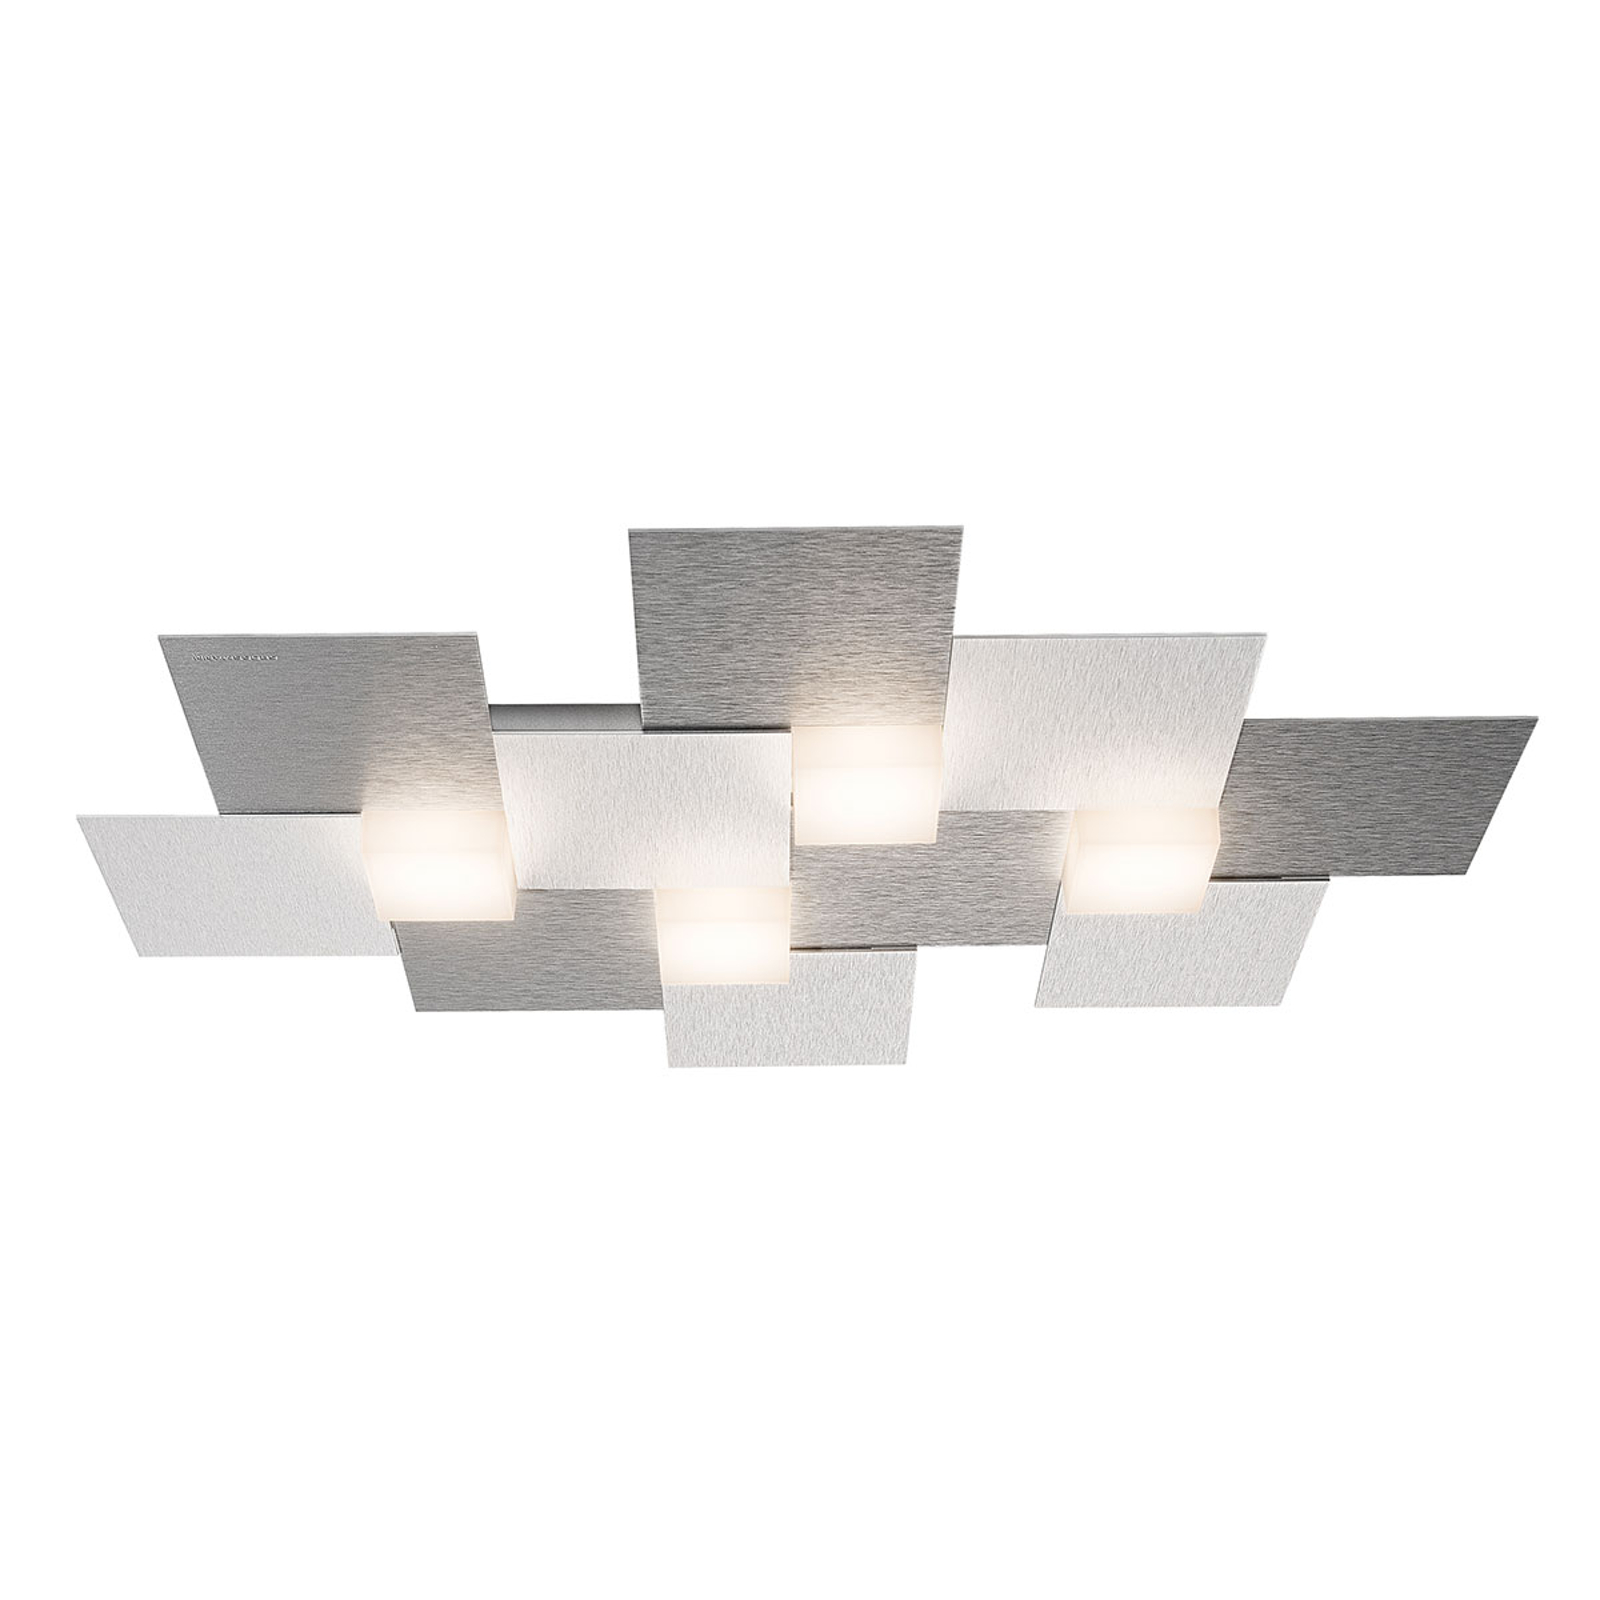 GROSSMANN Creo lampa sufitowa 4-pkt. 55x38,5